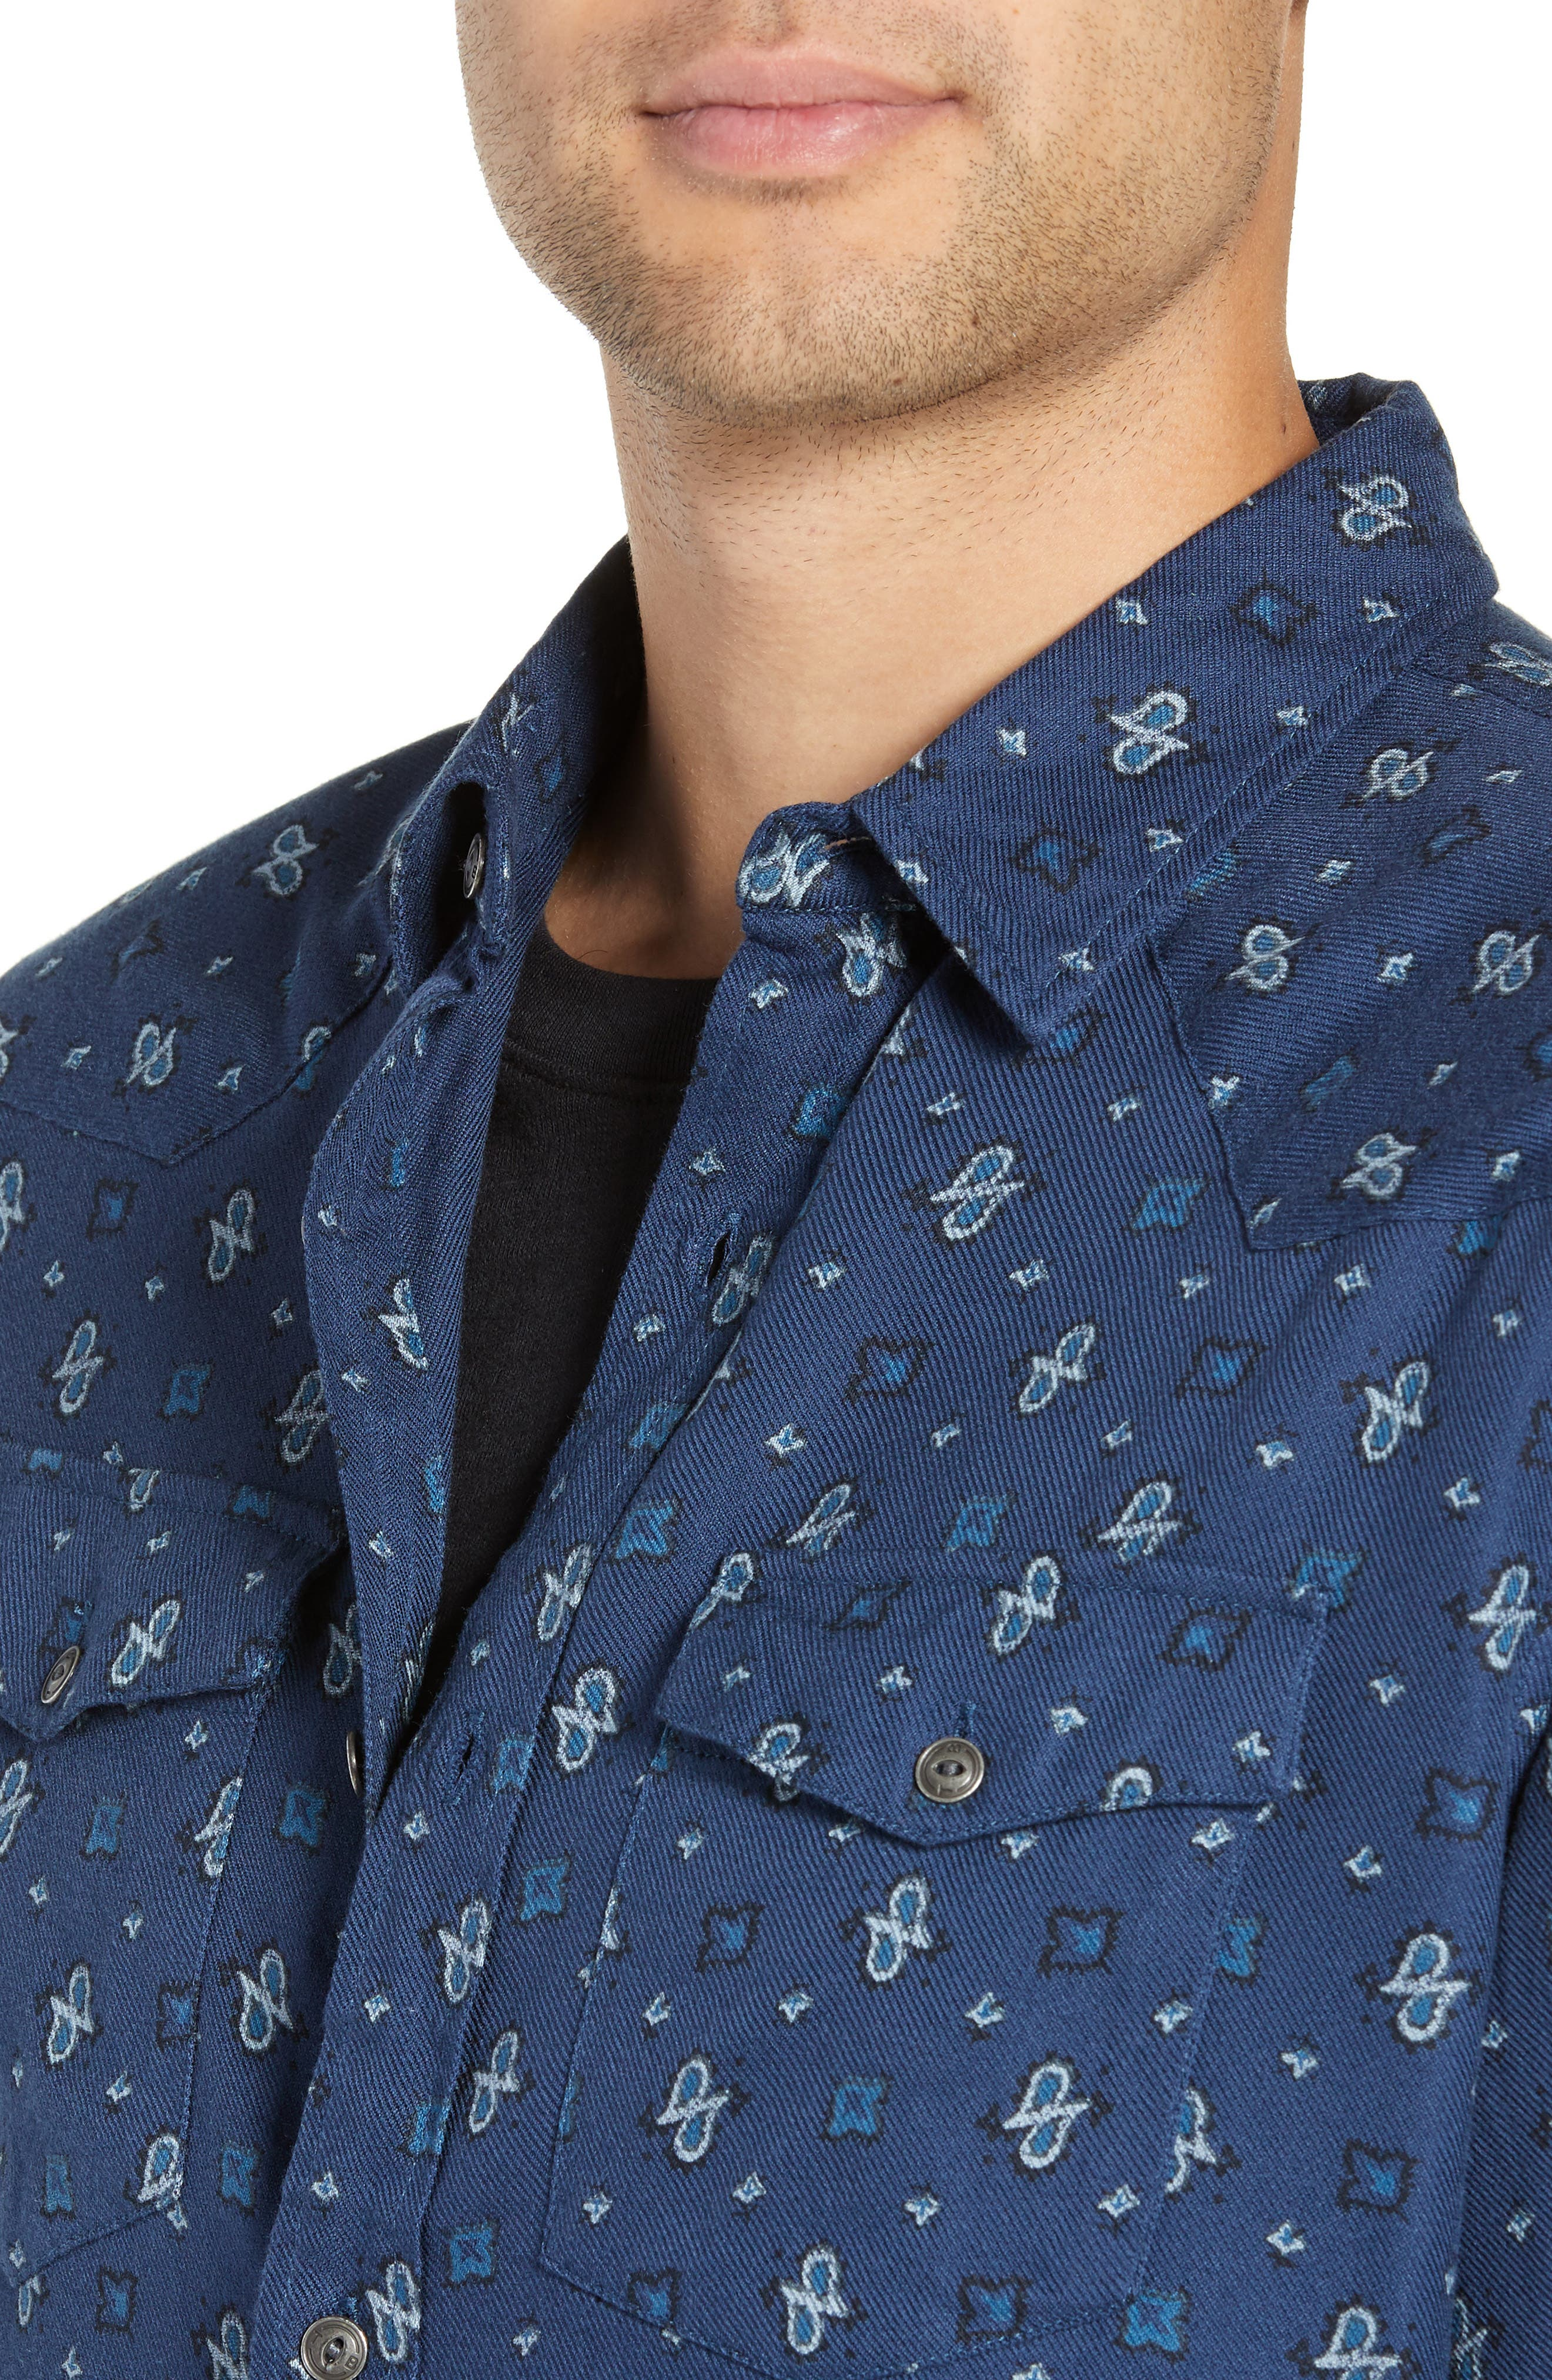 Regular Fit Paisley Western Shirt,                             Alternate thumbnail 2, color,                             BLUE CASPIA DESERT PAISLEY